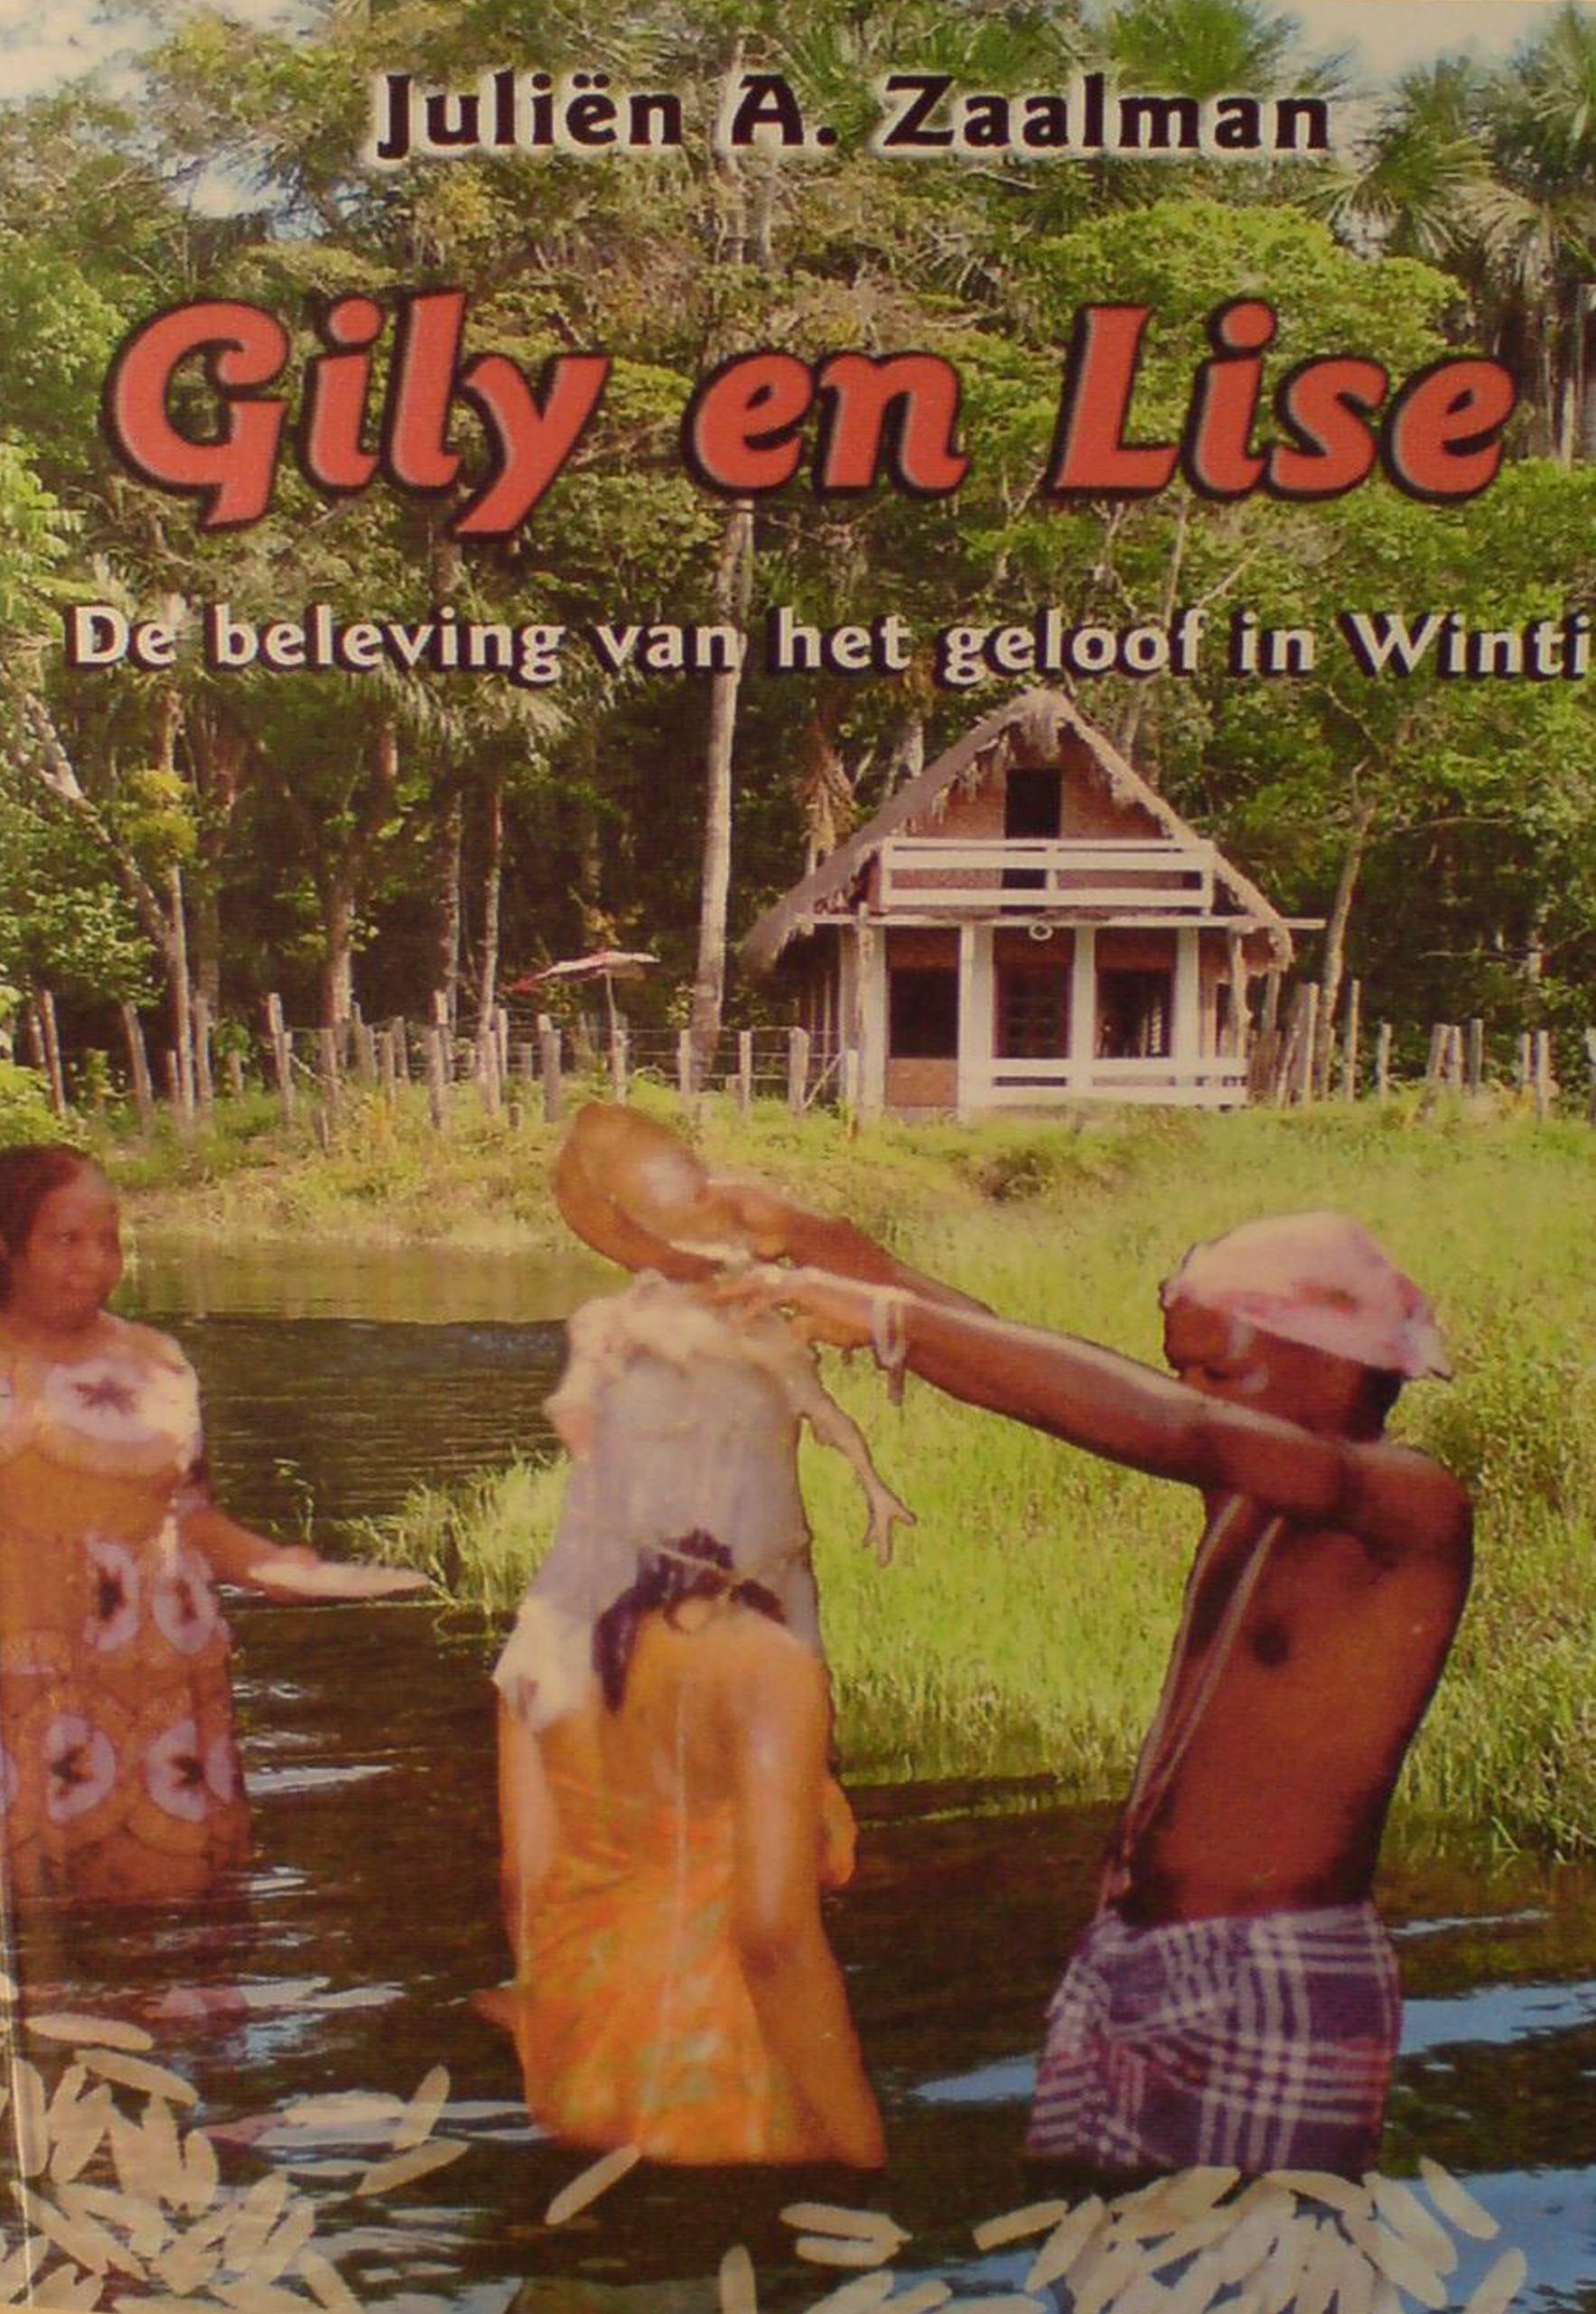 Gily en Lise: De beleving van het geloof in Winti  by  Juliën A. Zaalman